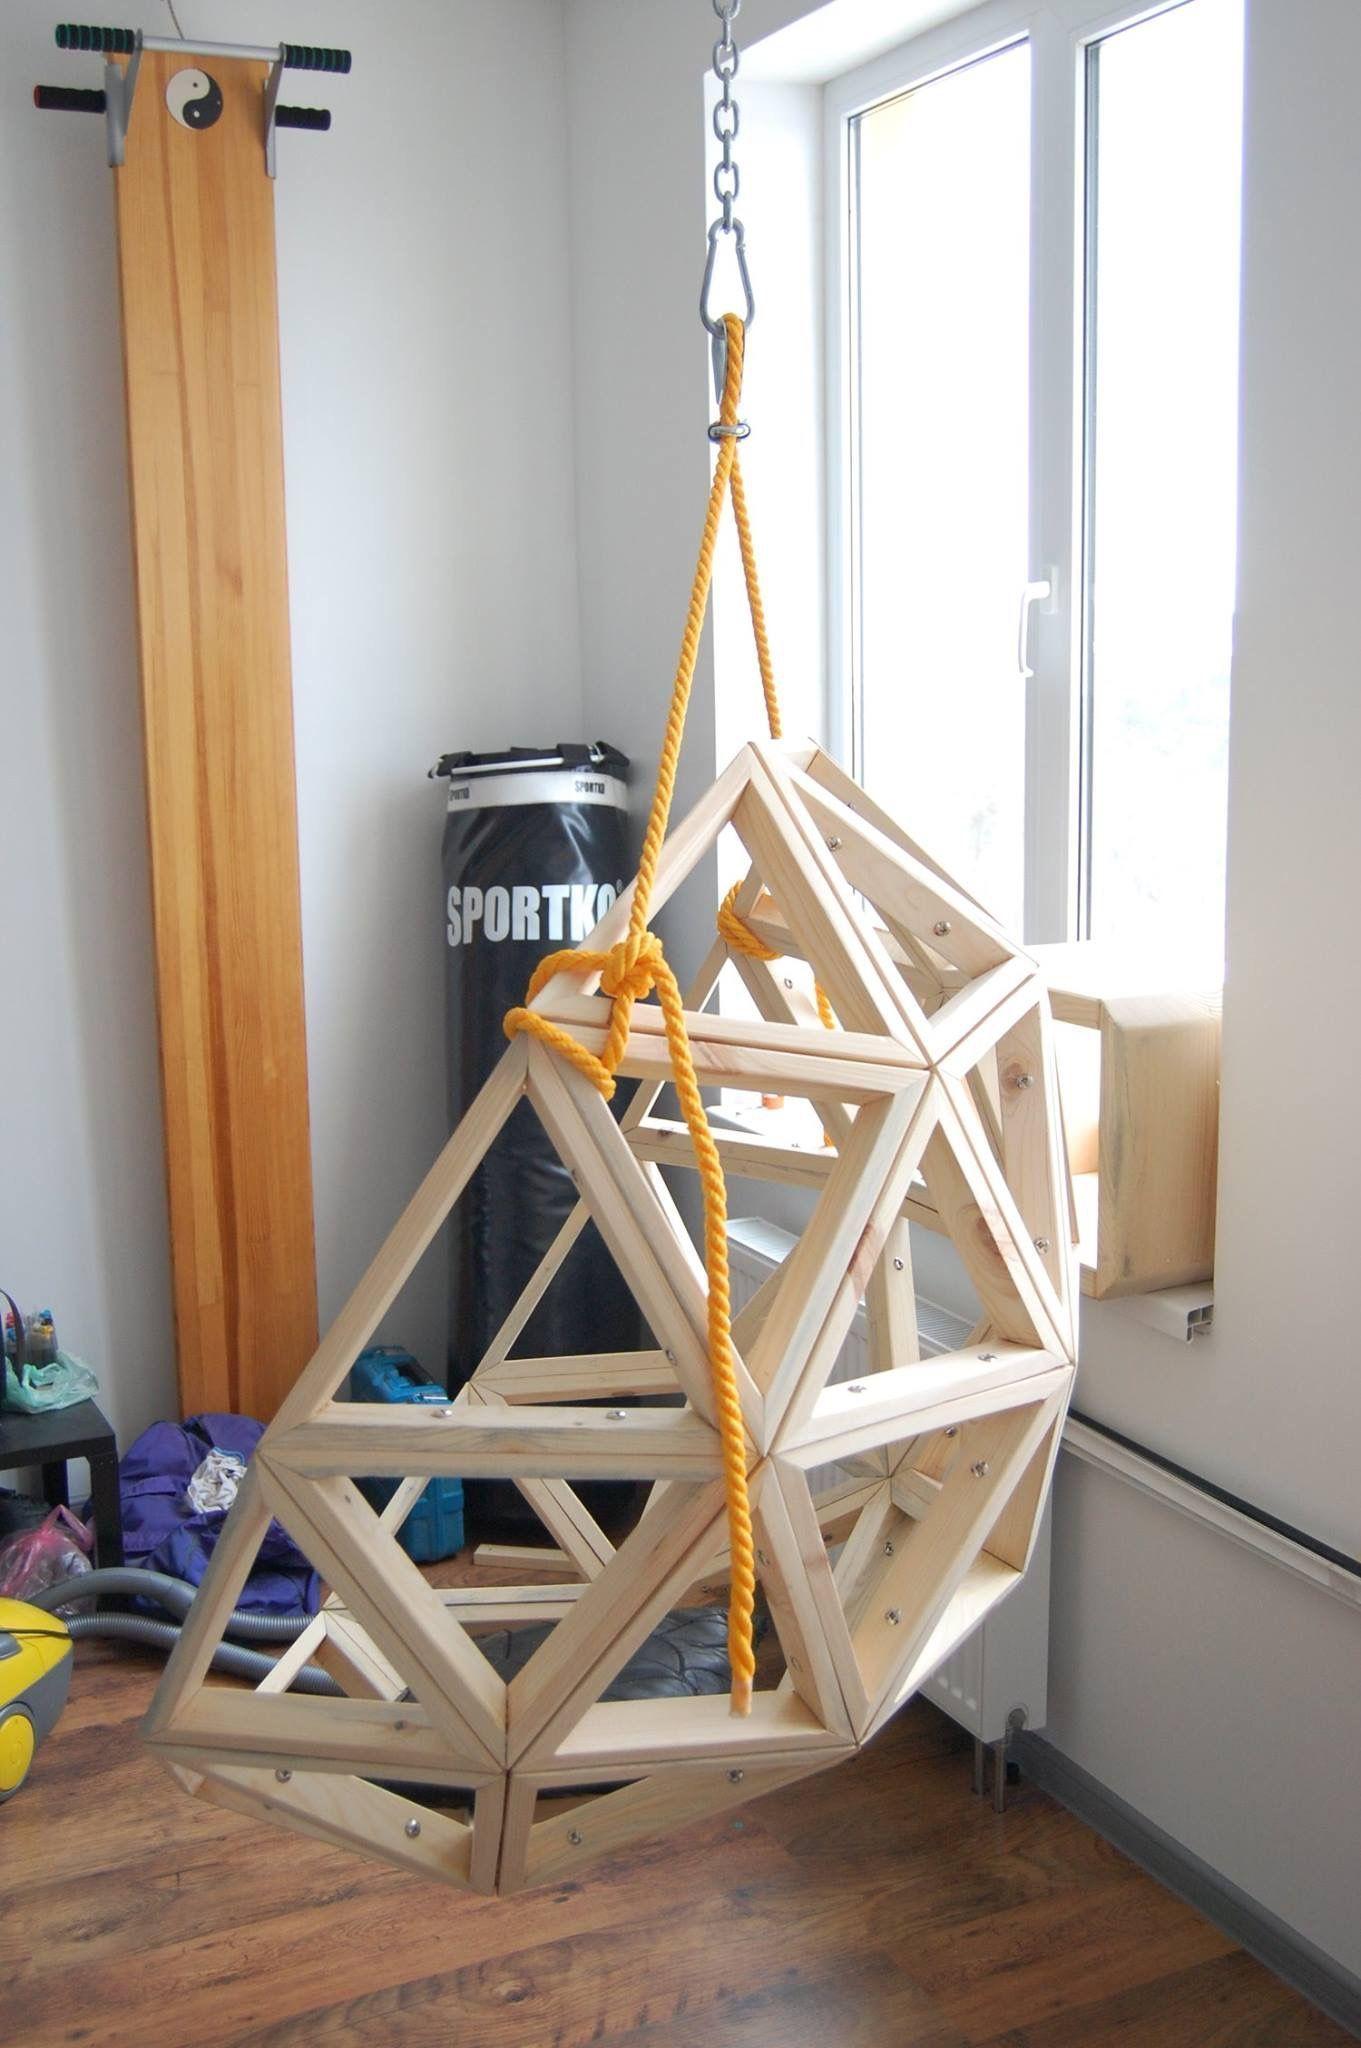 Quejlaverga Chino De Madera Woodenhangingchair Muebles